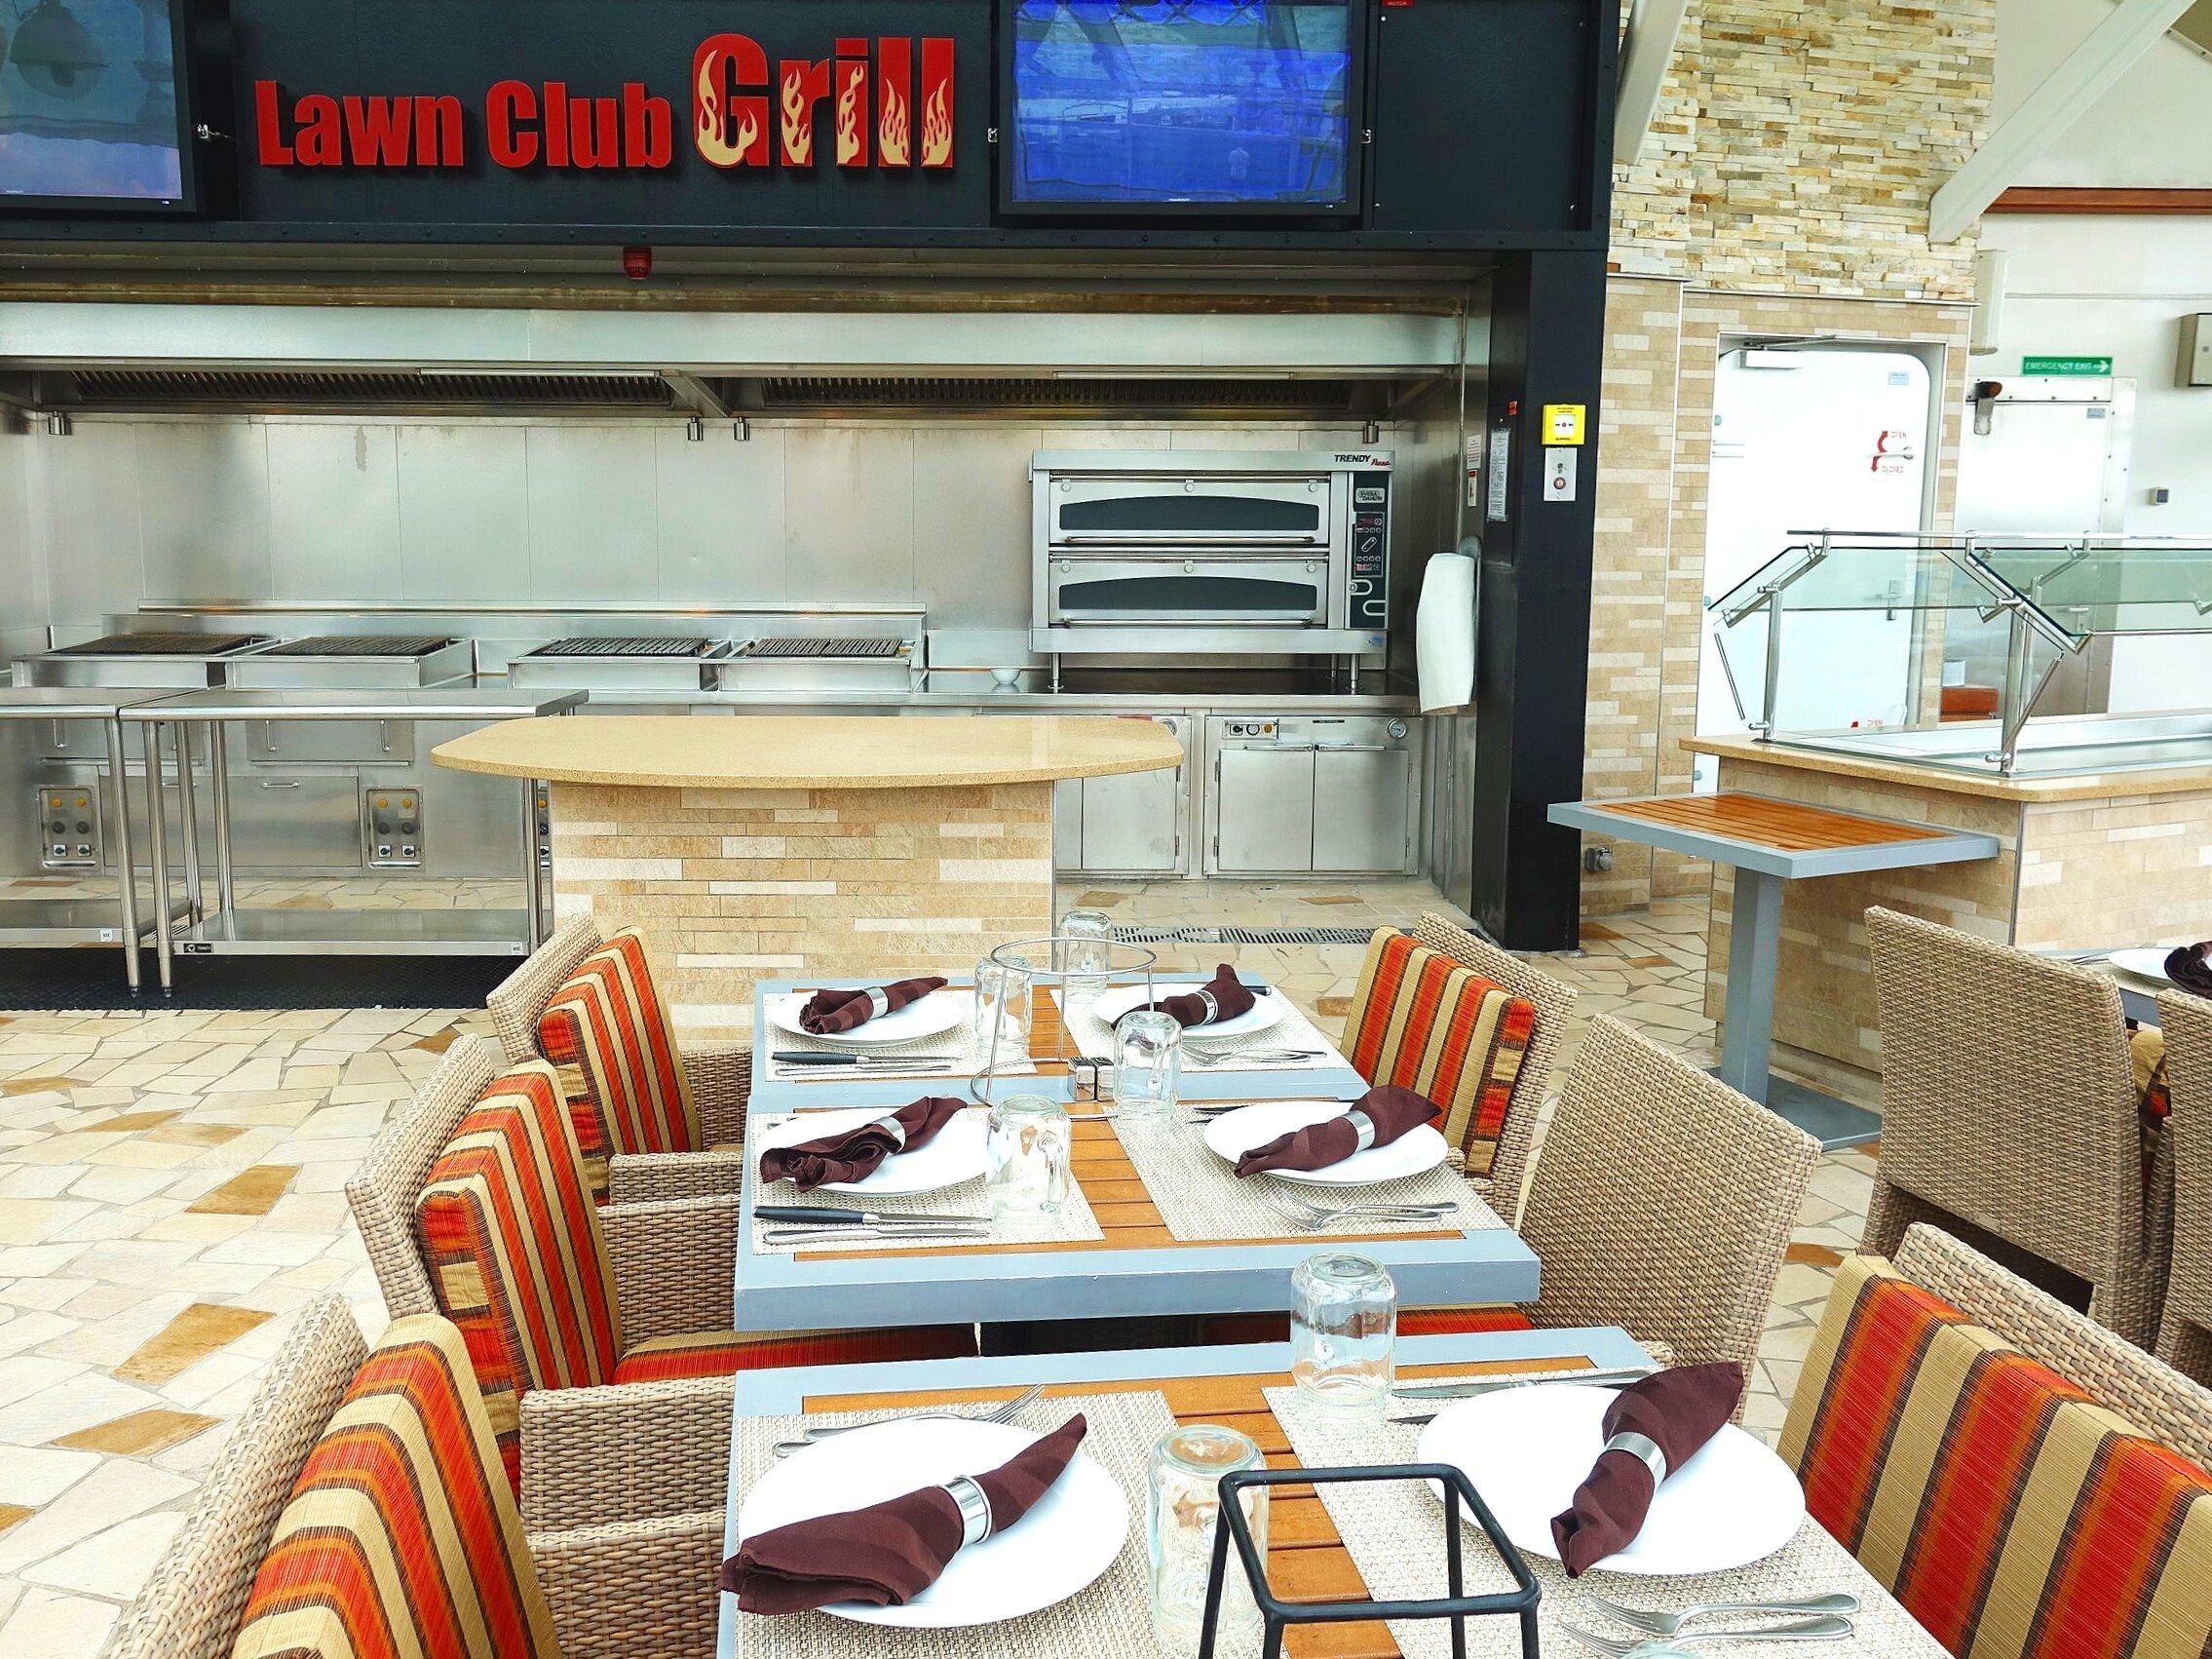 Inside the Lawn Club grill